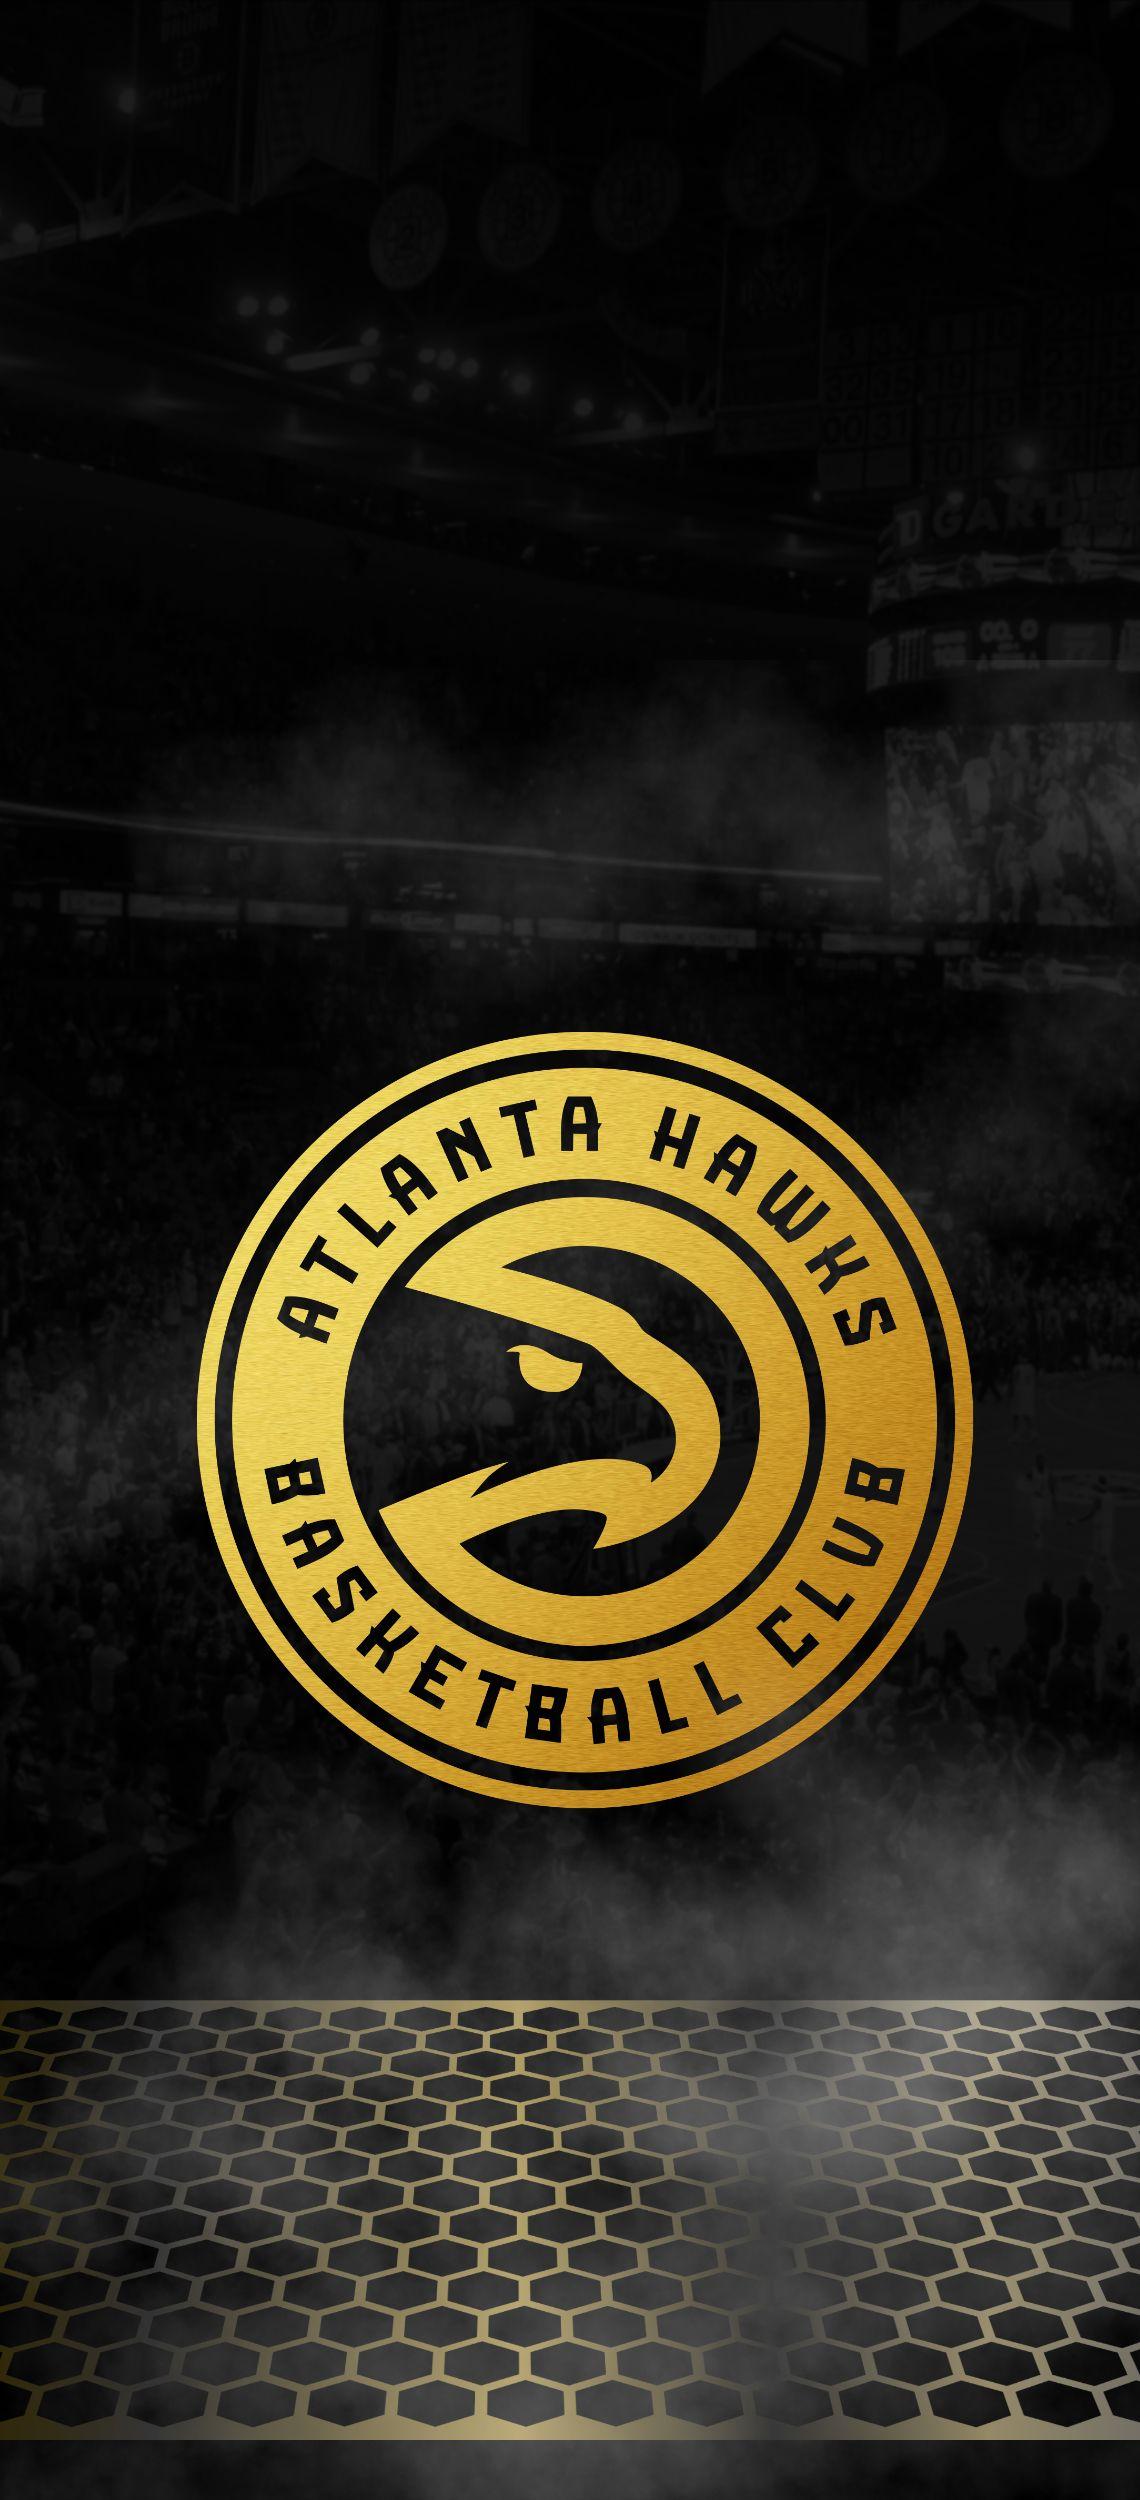 NBA Team Atlanta Hawks iPhone Background Wallpaper